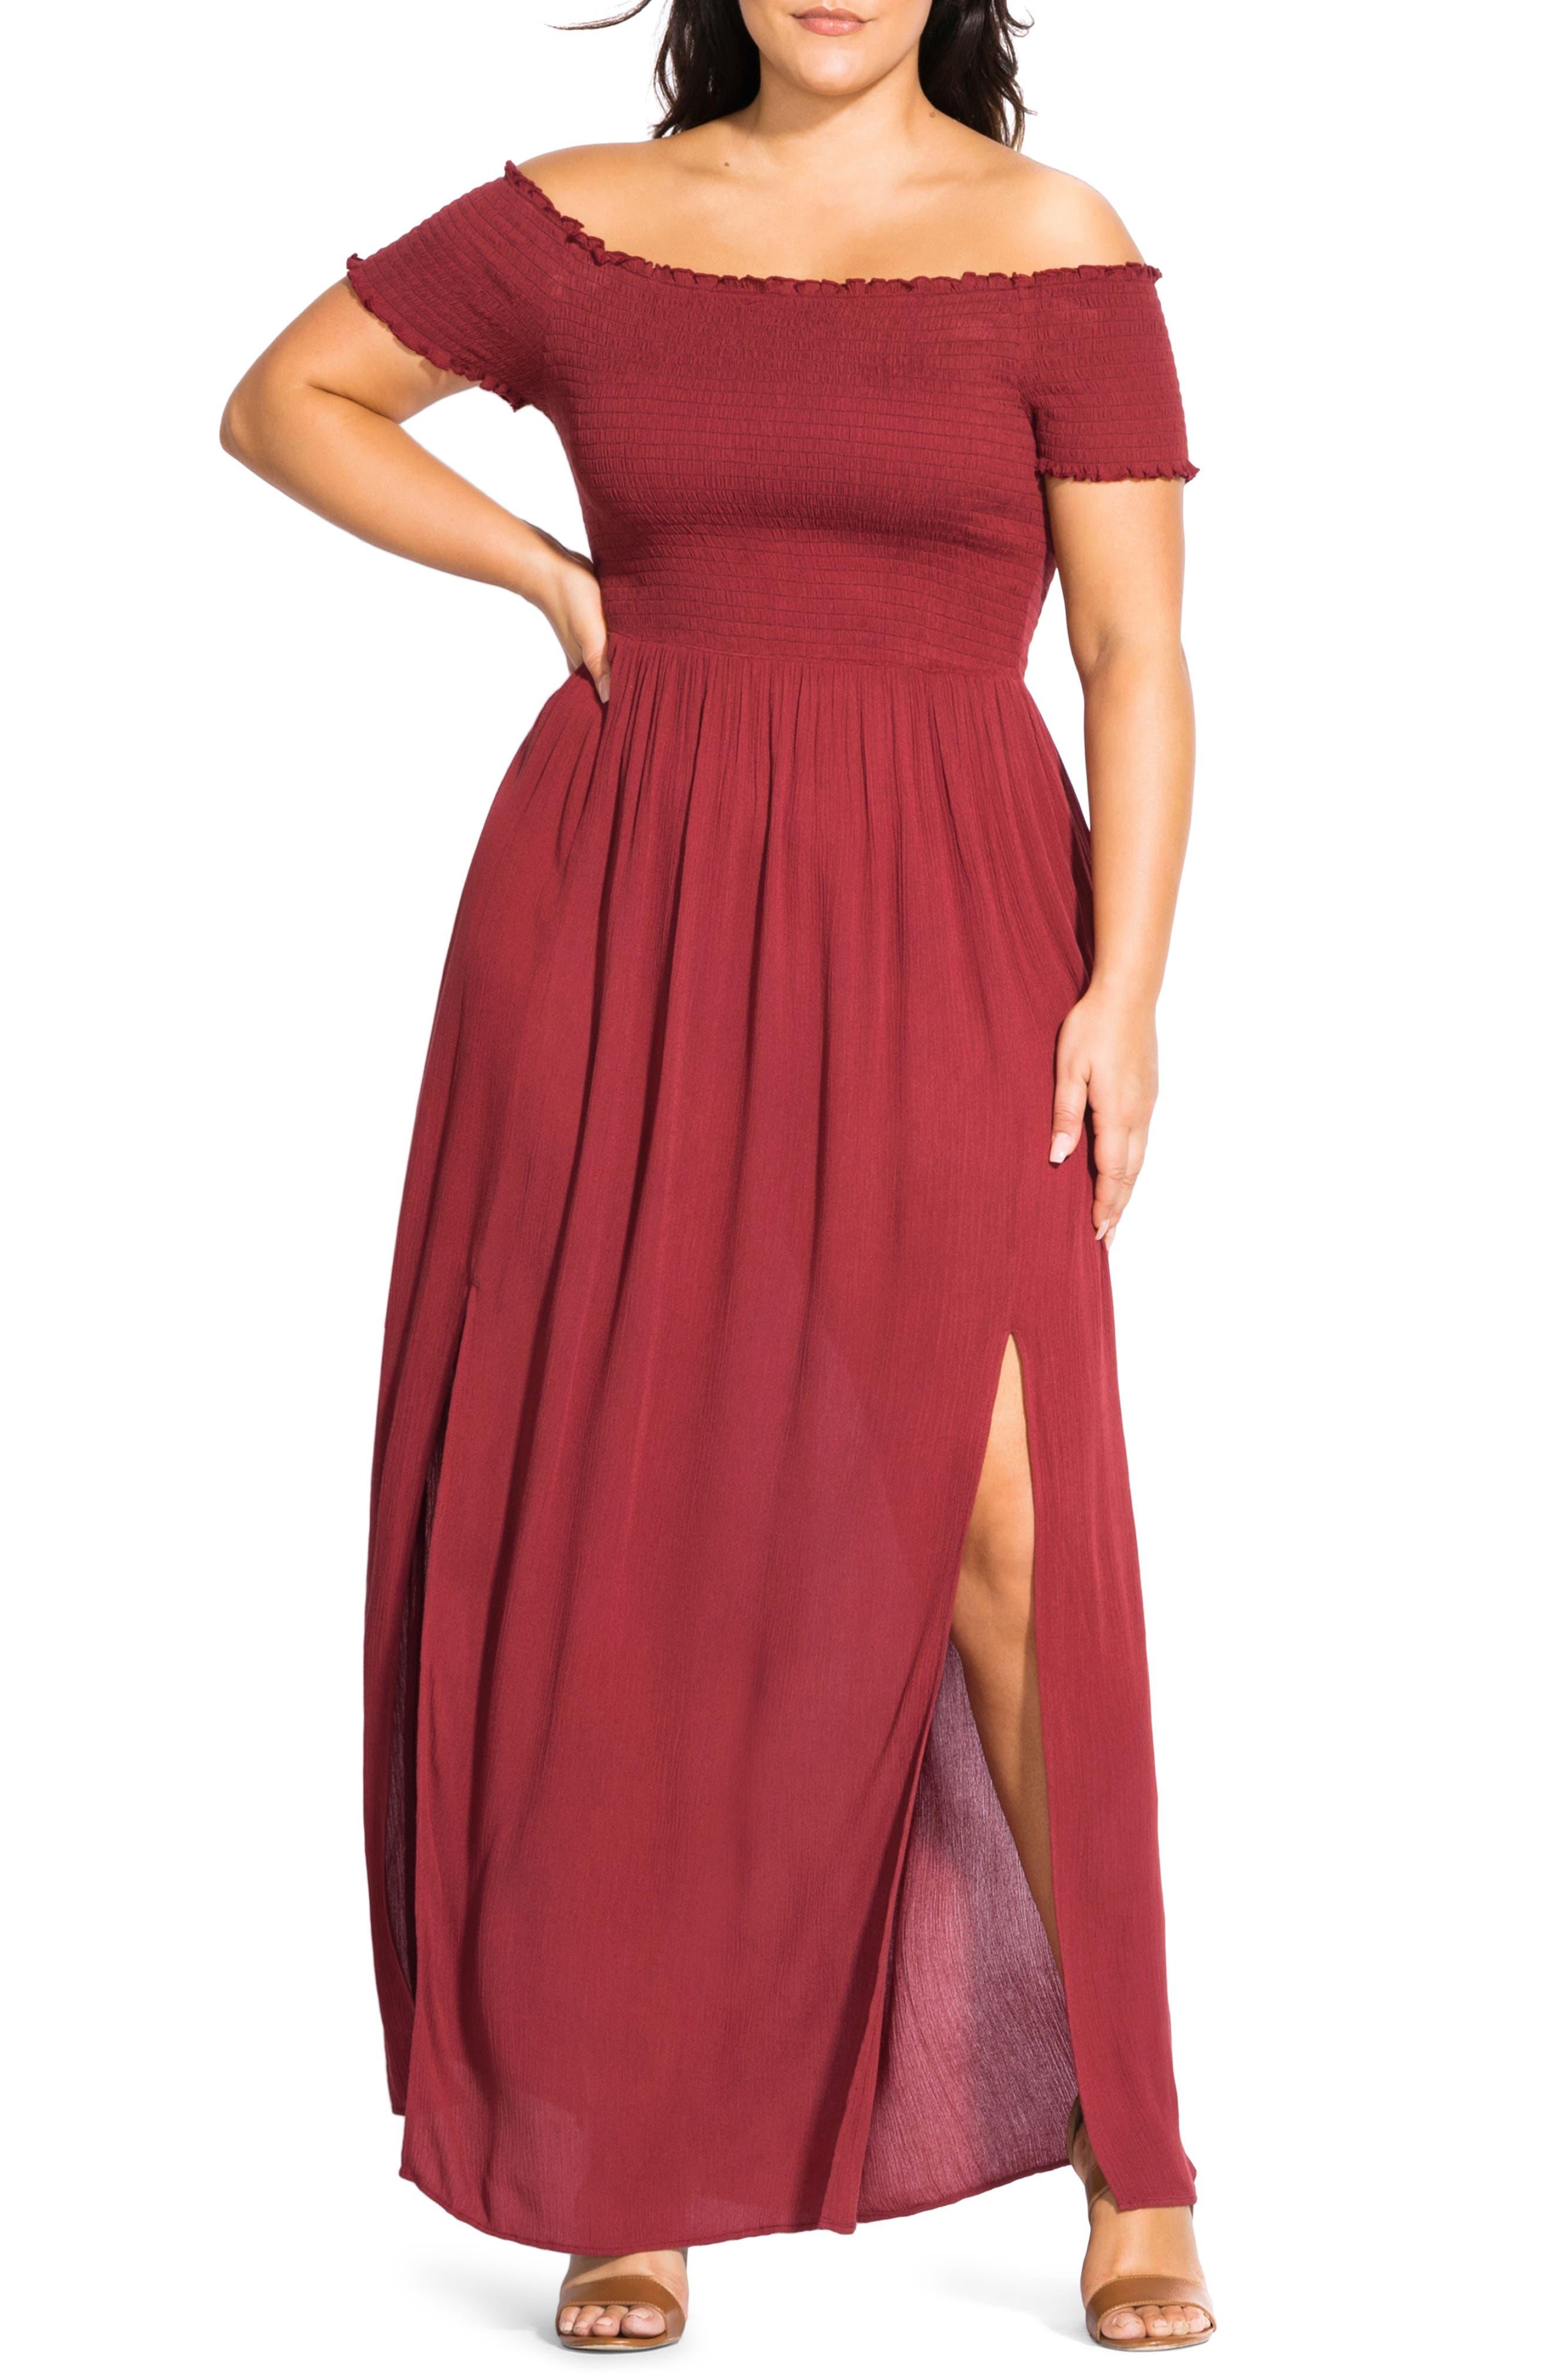 Plus Size City Chic Summer Passion Off The Shoulder Maxi Sundress, Orange